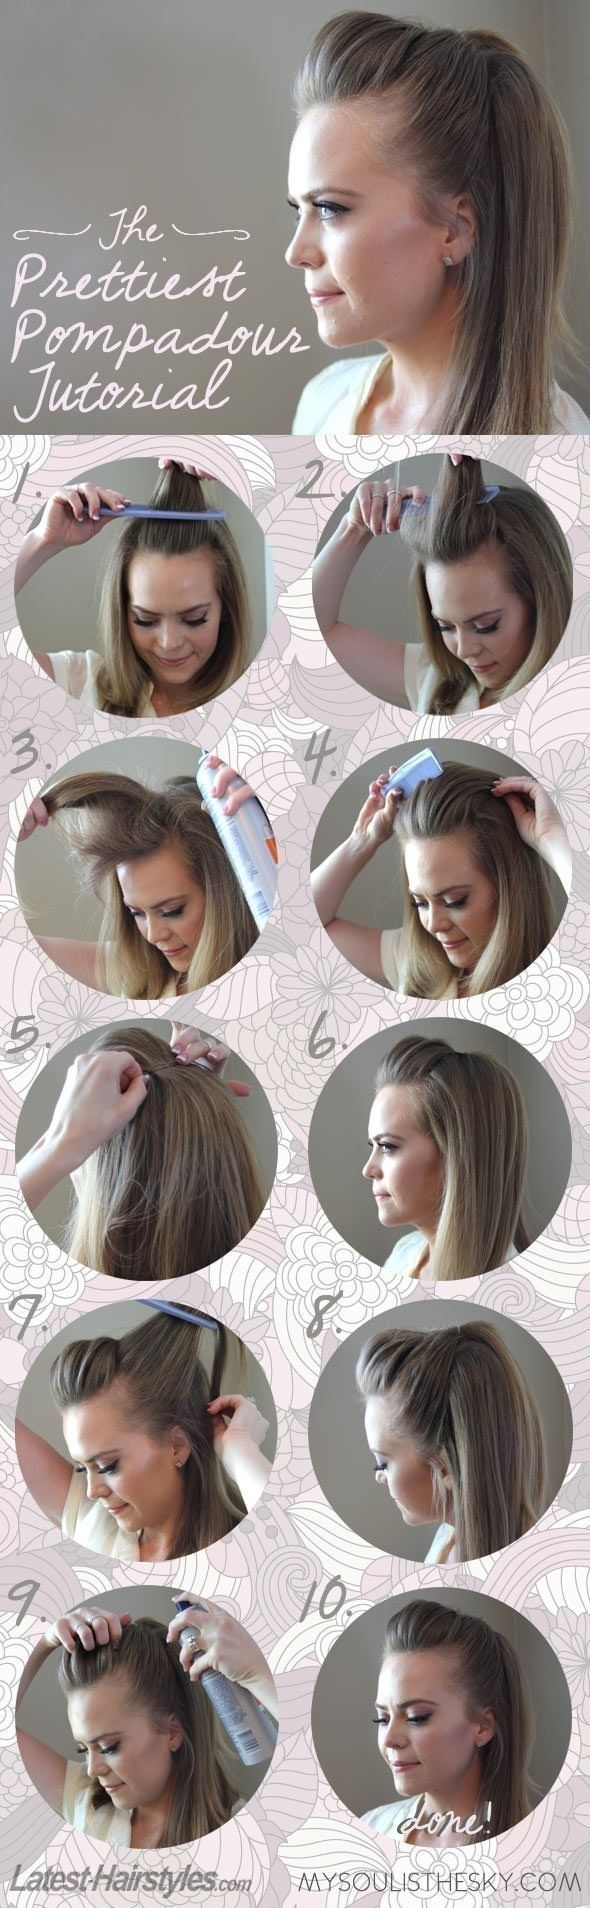 Süße Frisur, um lästige Haare loszuwerden.